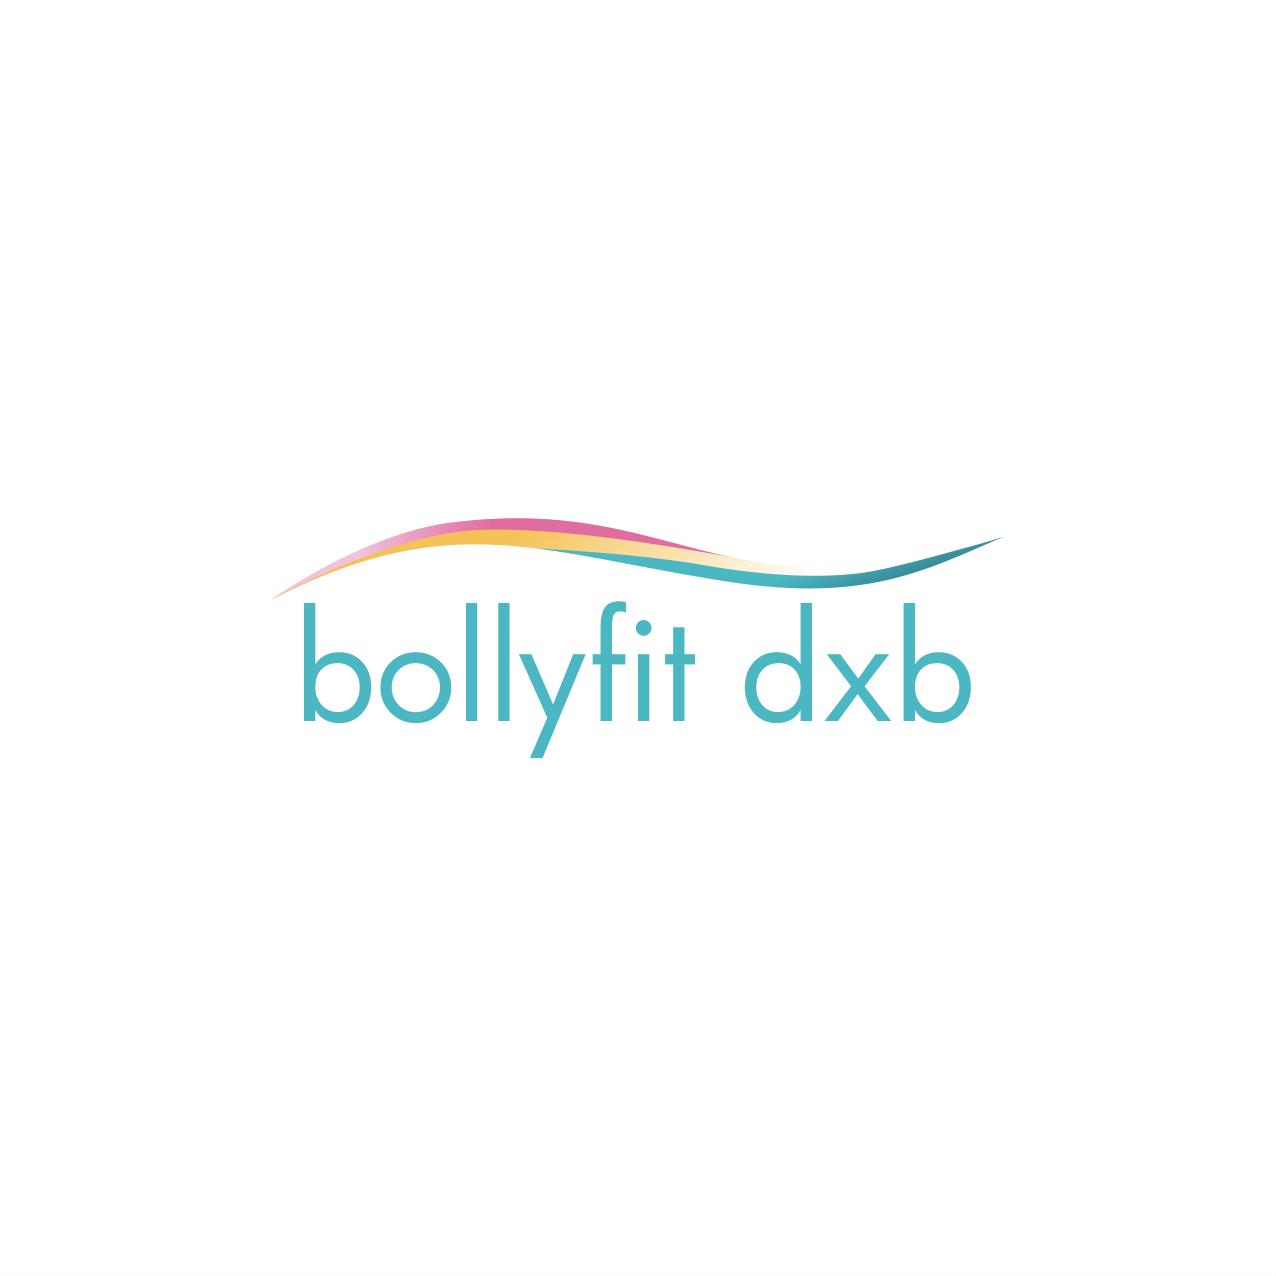 Bollyfit dxb logo